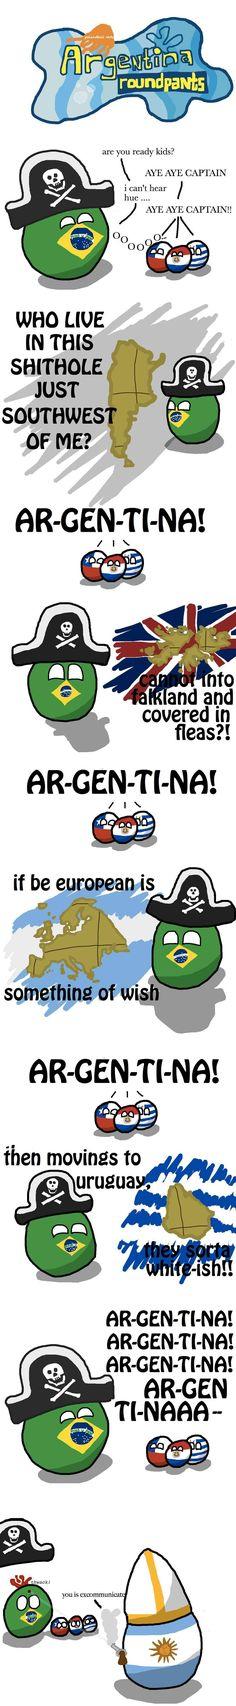 """Argentina Roundpants"" ( Brazil, Chile, Paraguay, Uruguay, Argentina ) by krackpotkin  https://www.reddit.com/r/polandball/comments/1feg6n/argentina_roundpants/ #polandball #countryball"